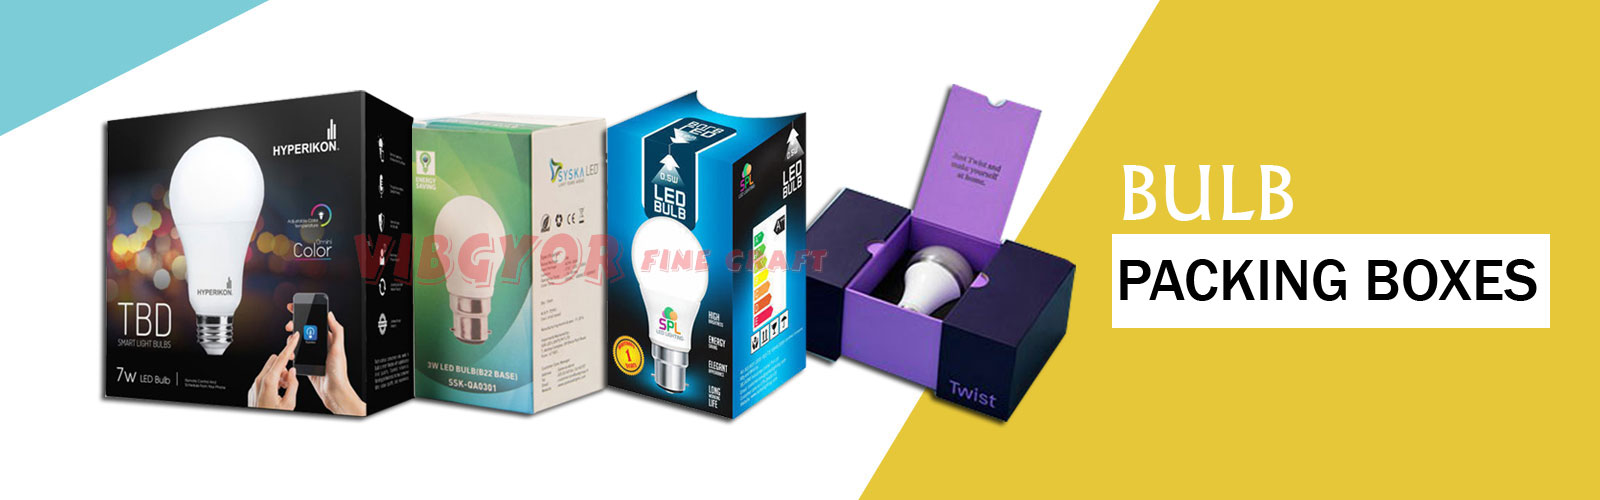 Bulb Boxes